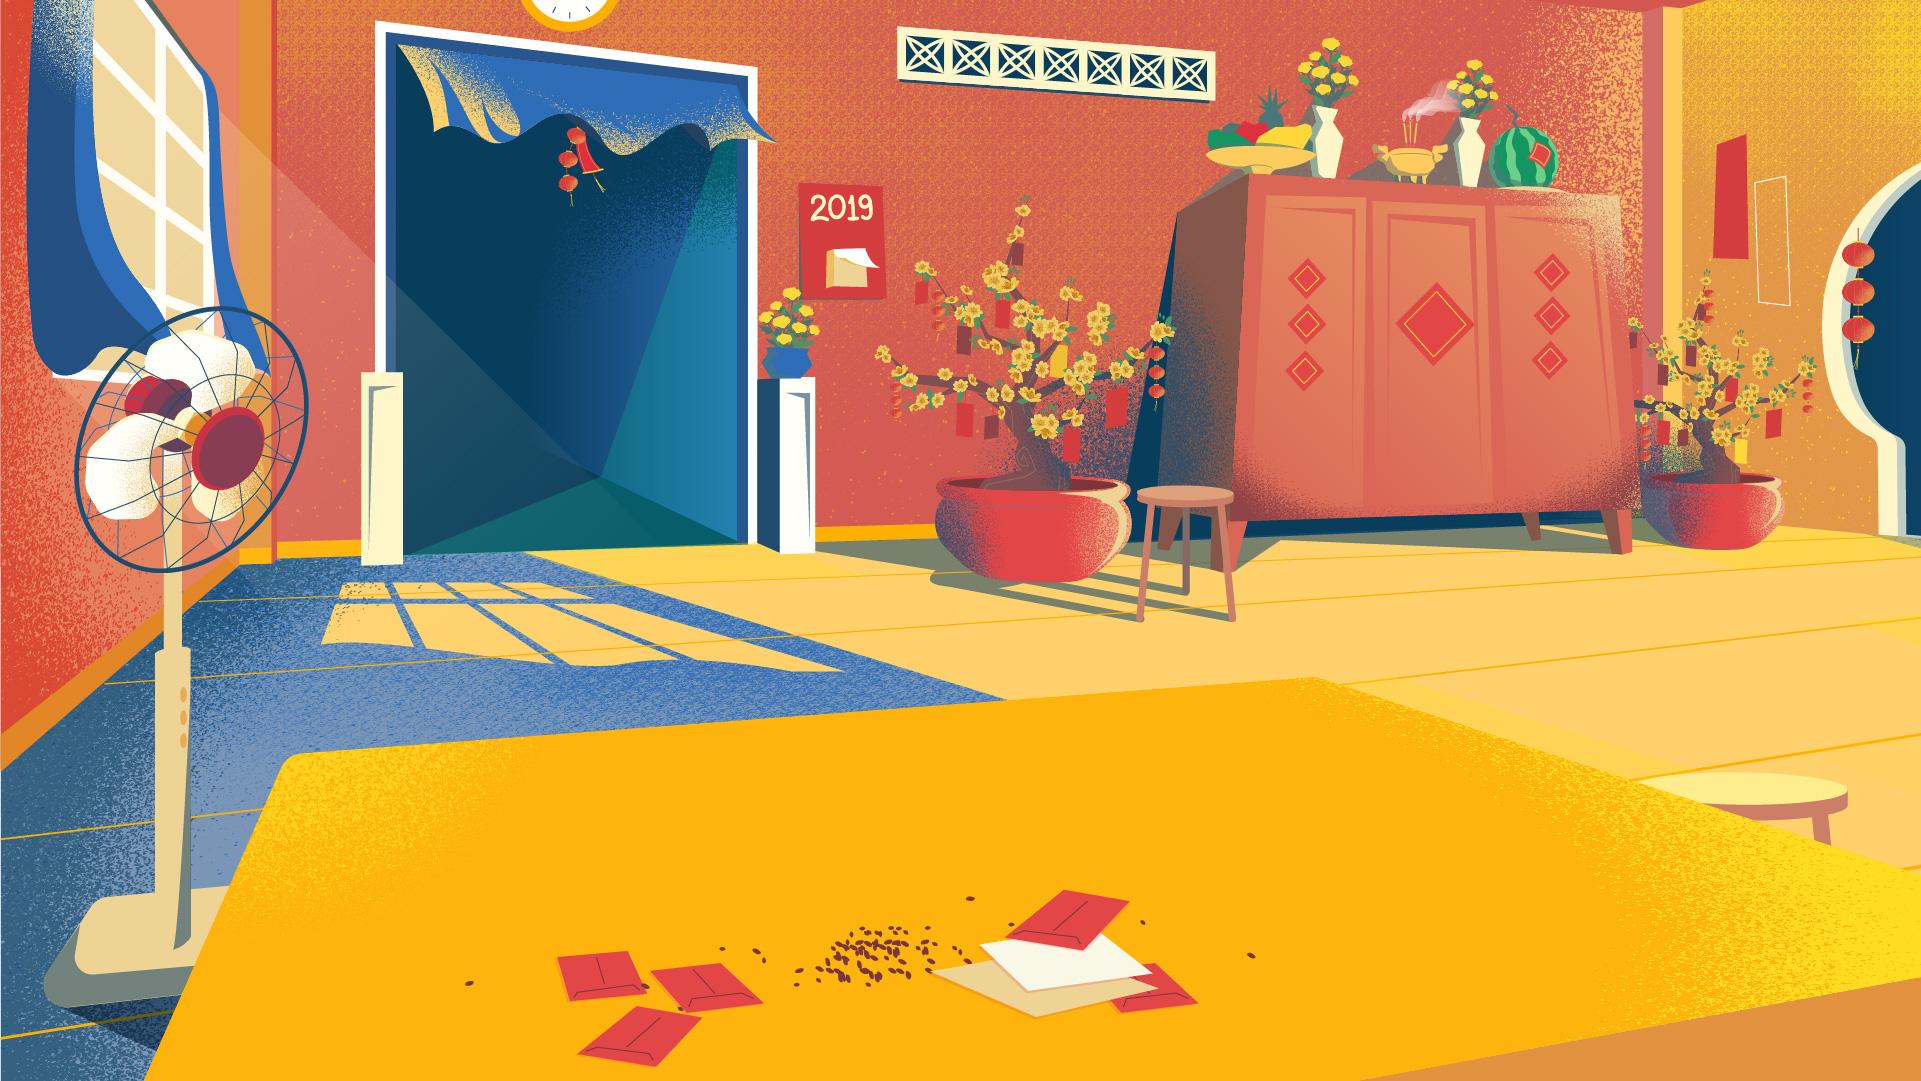 Bitis-Boardgame_Styleframe2_181203-03.jpg